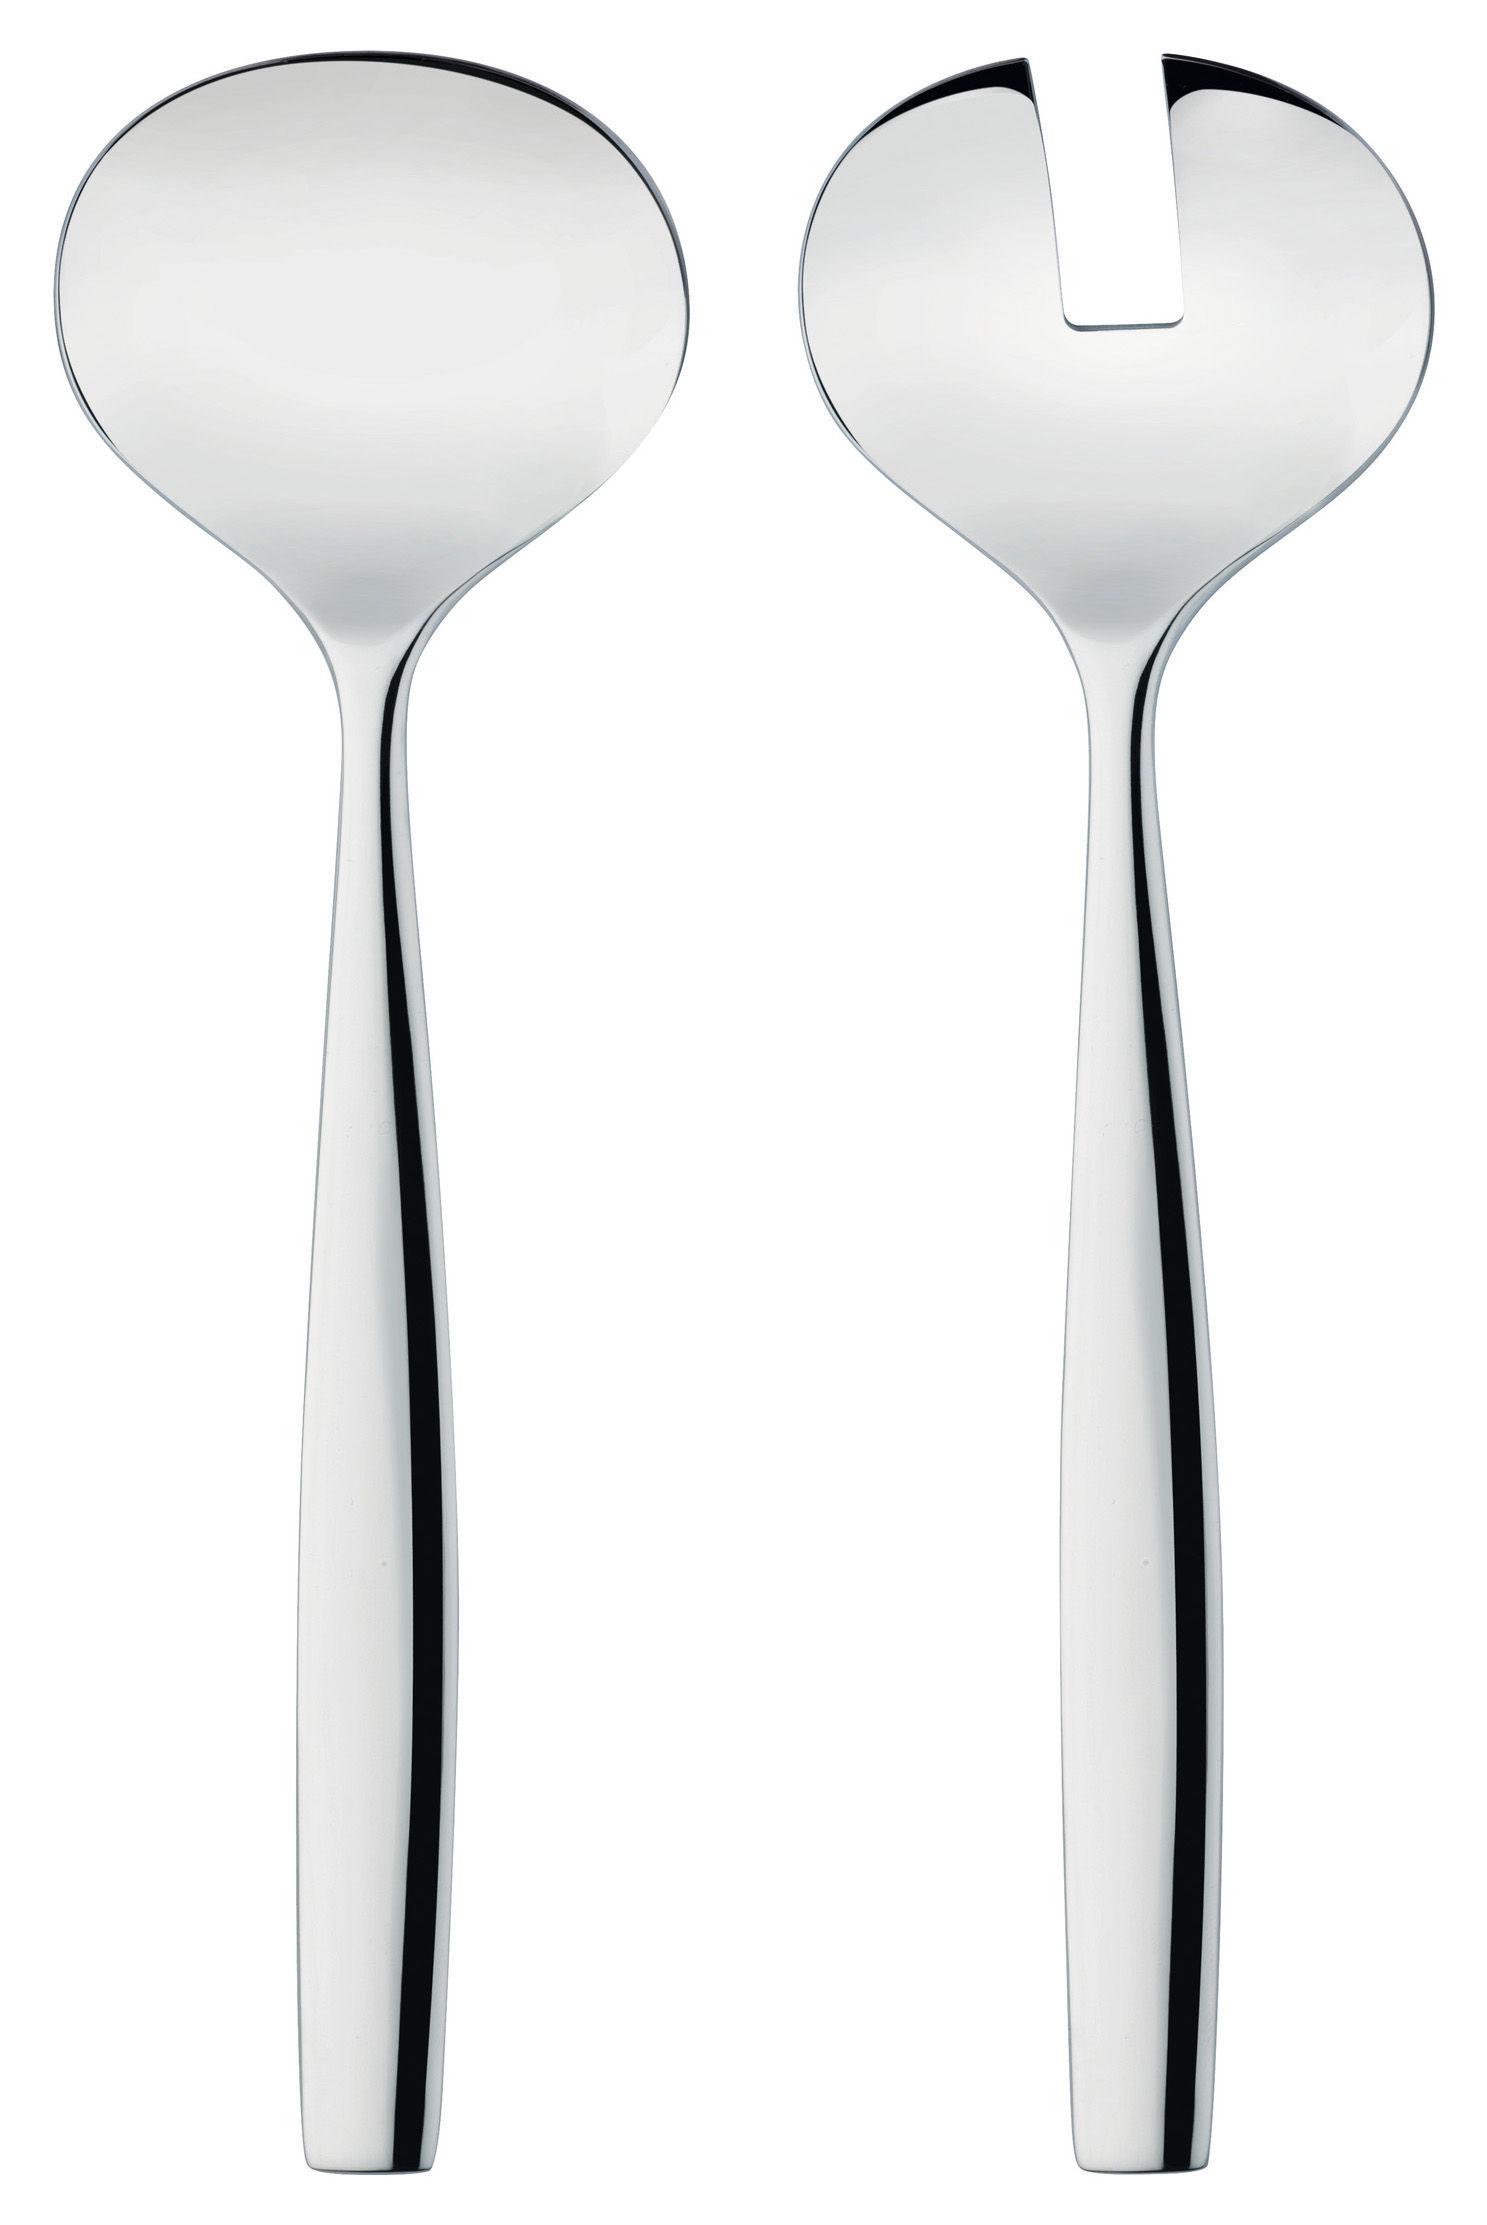 Tischkultur - Couverts de service - Dressed Salatbesteck - Alessi - Salatbesteck - Edelstahl - rostfreier Stahl